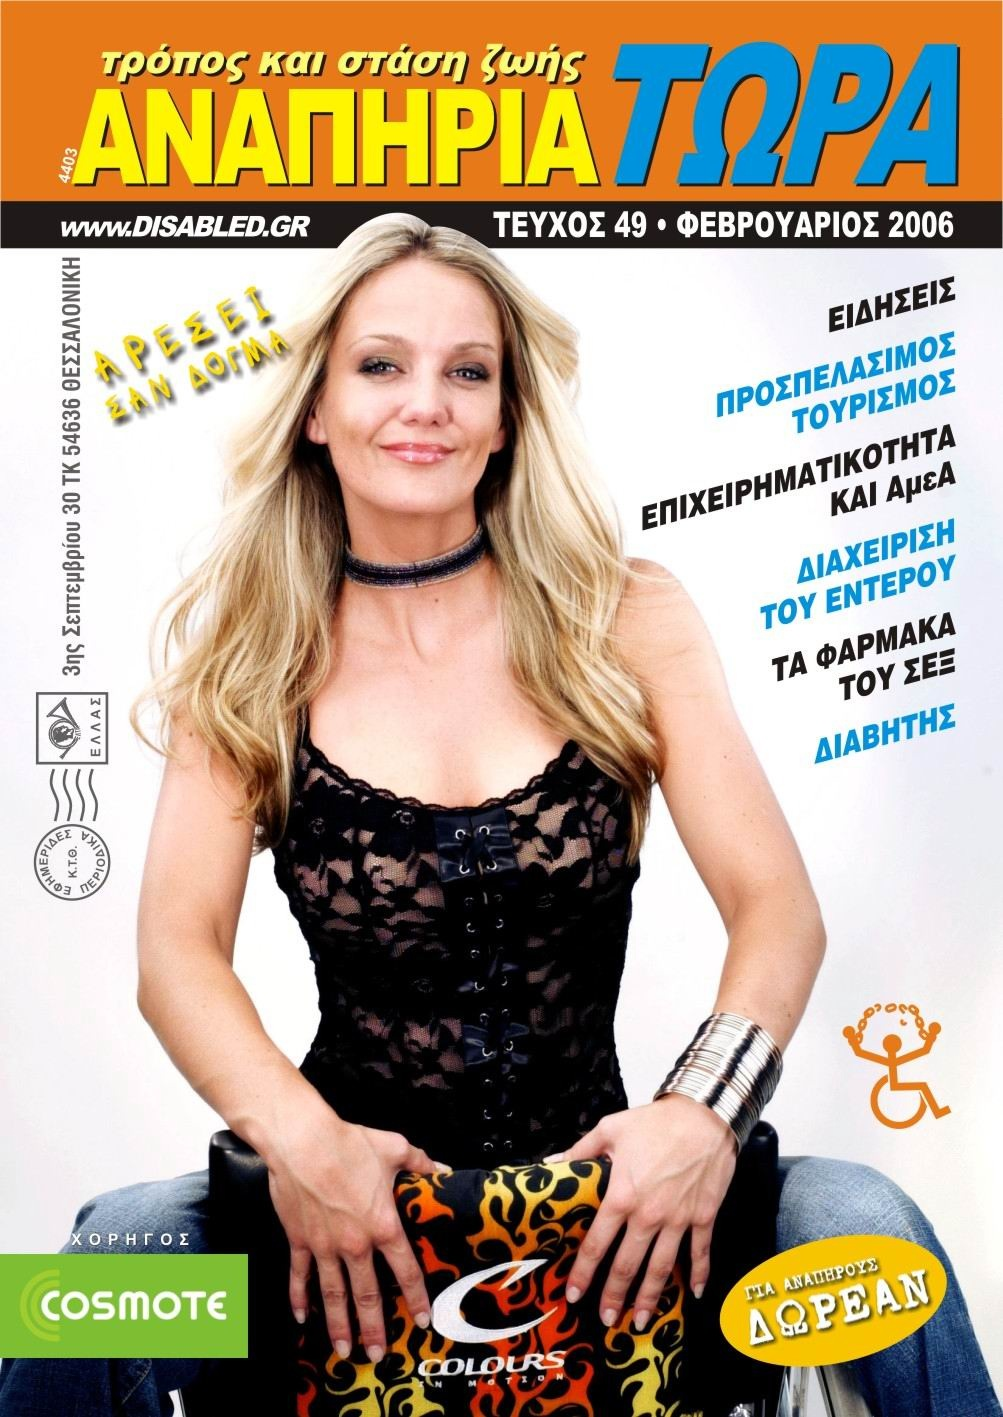 Greece Magazine cover.jpg